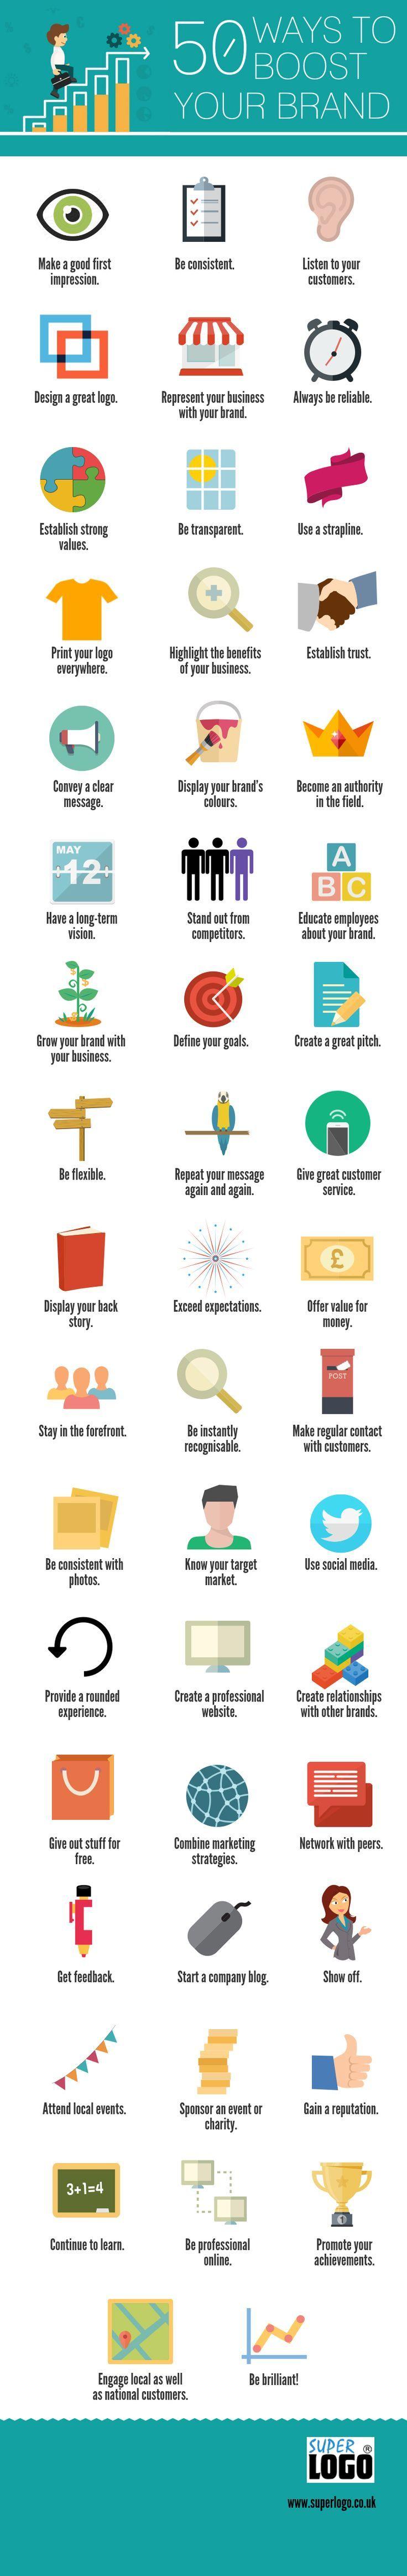 50-ways-to-increase-brand-awareness